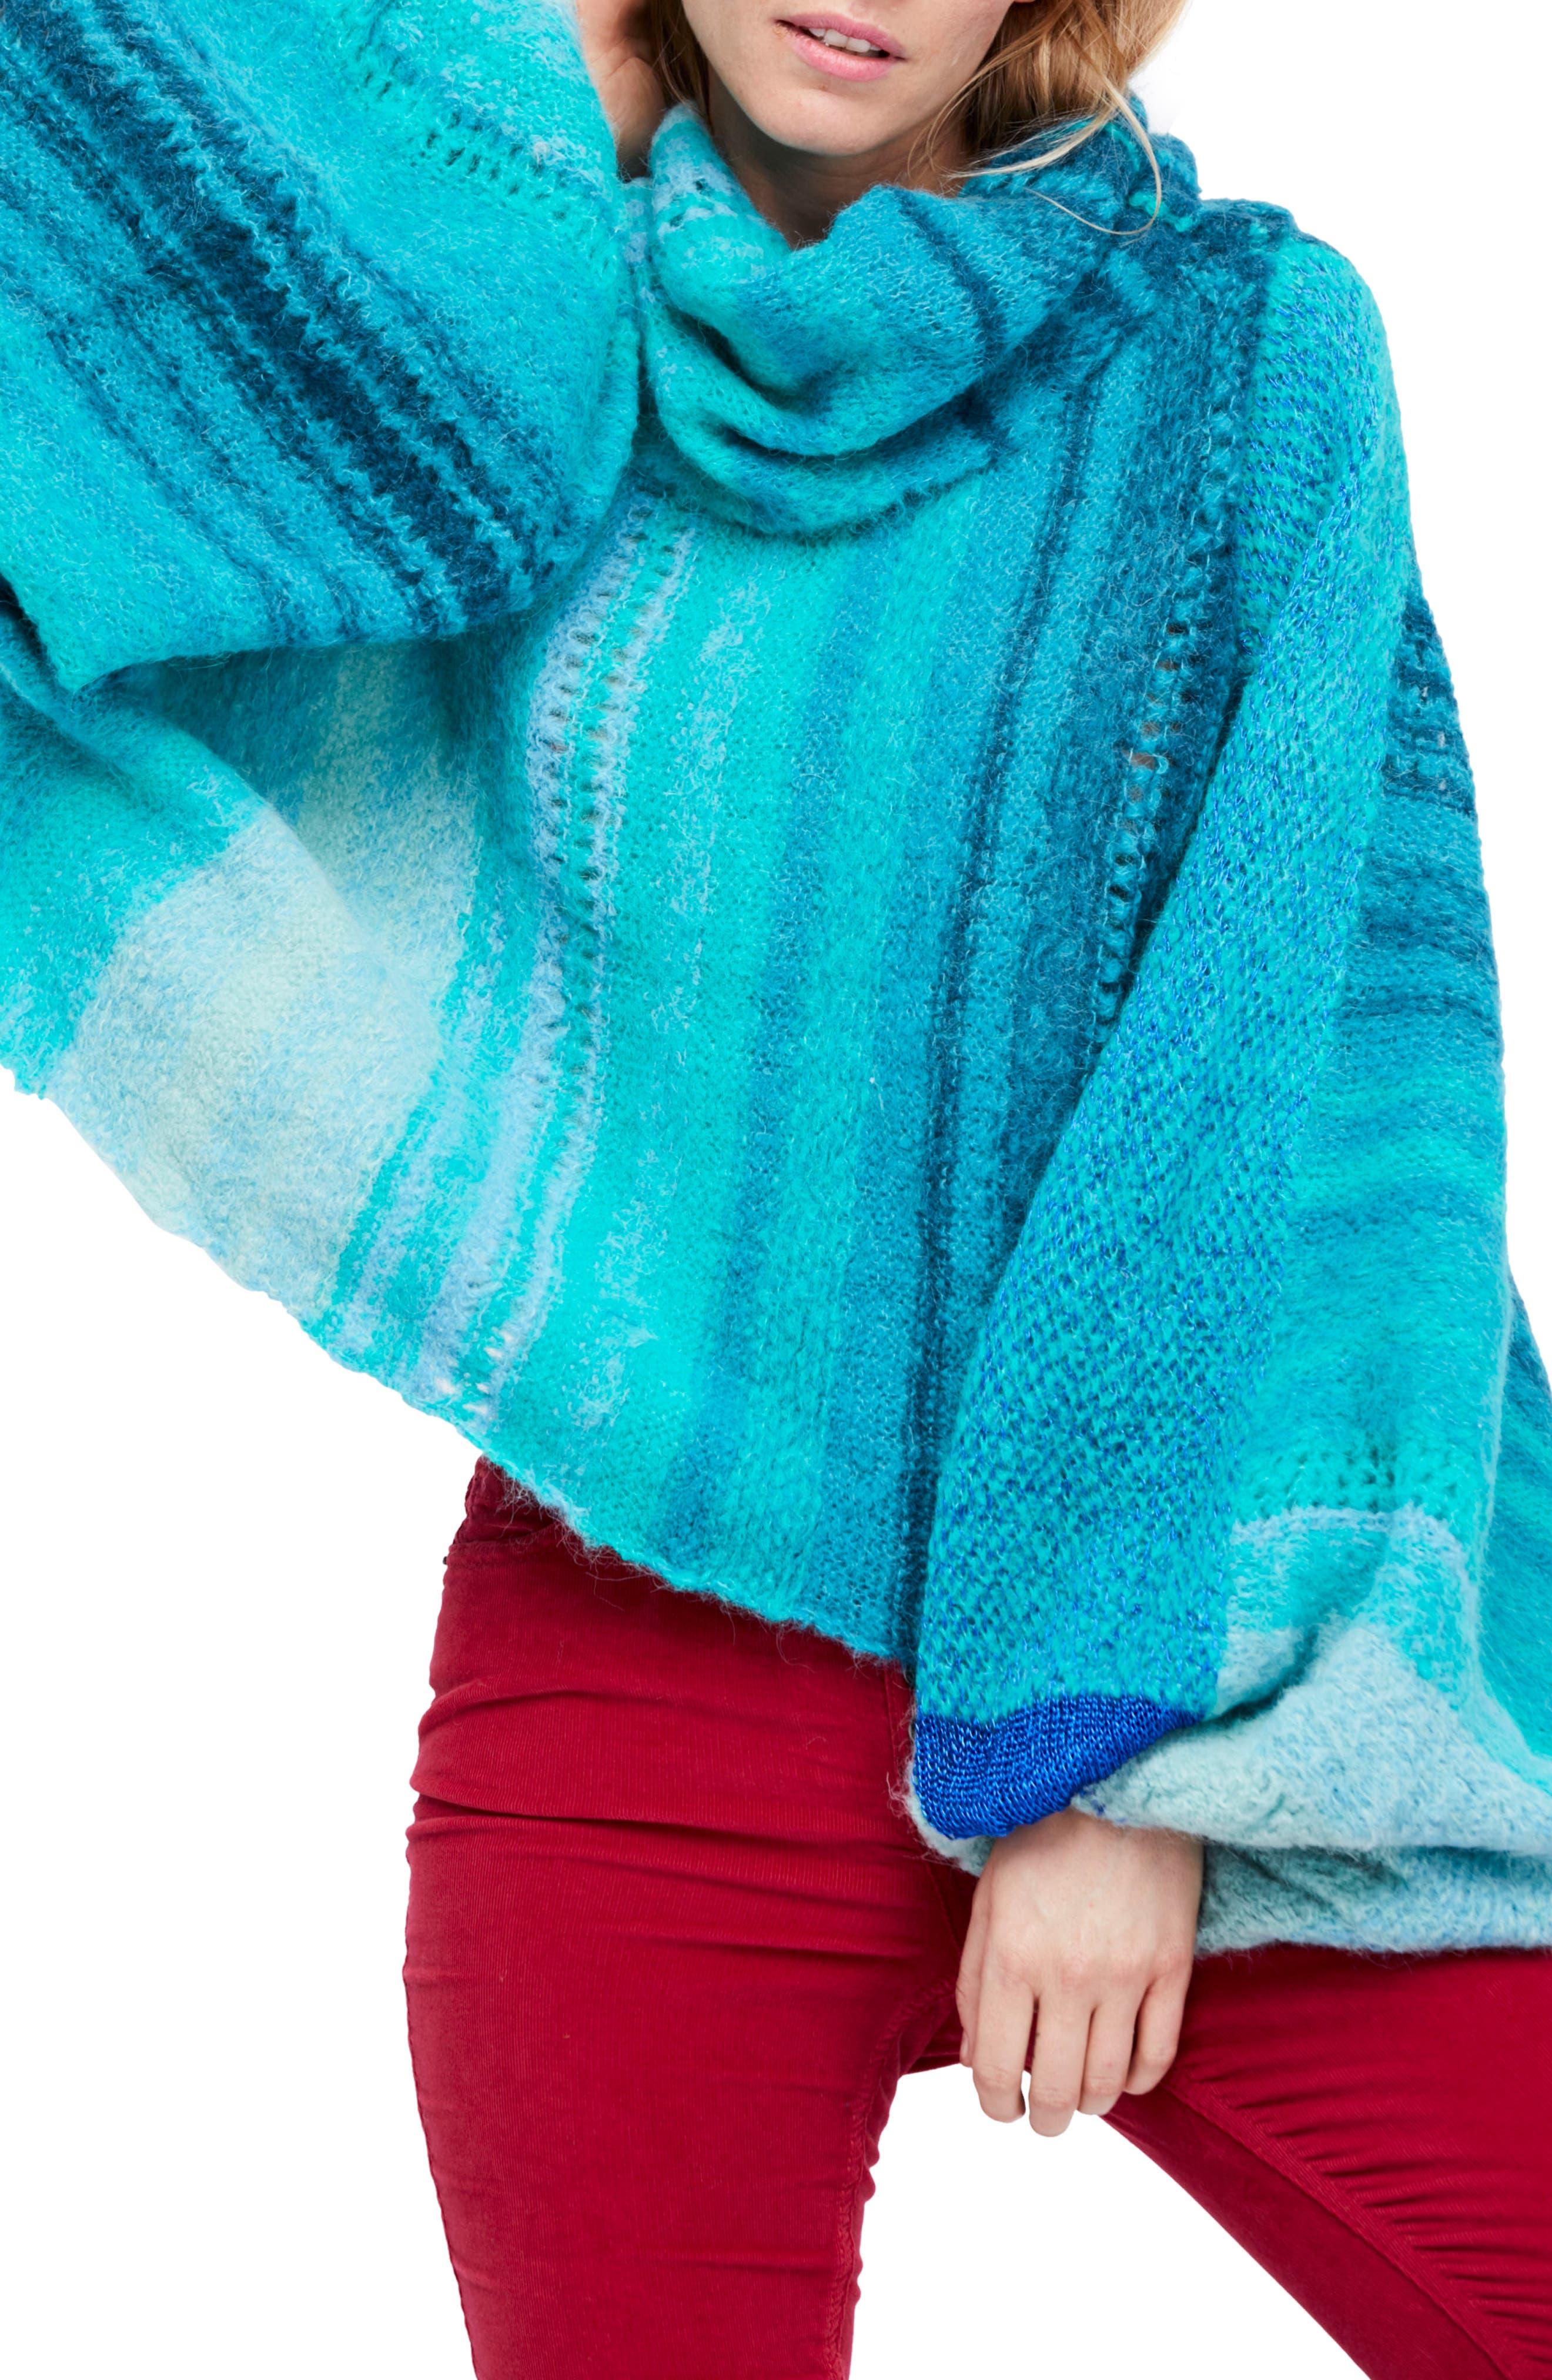 Cloud Kicker Sweater,                             Main thumbnail 1, color,                             Blue Combo